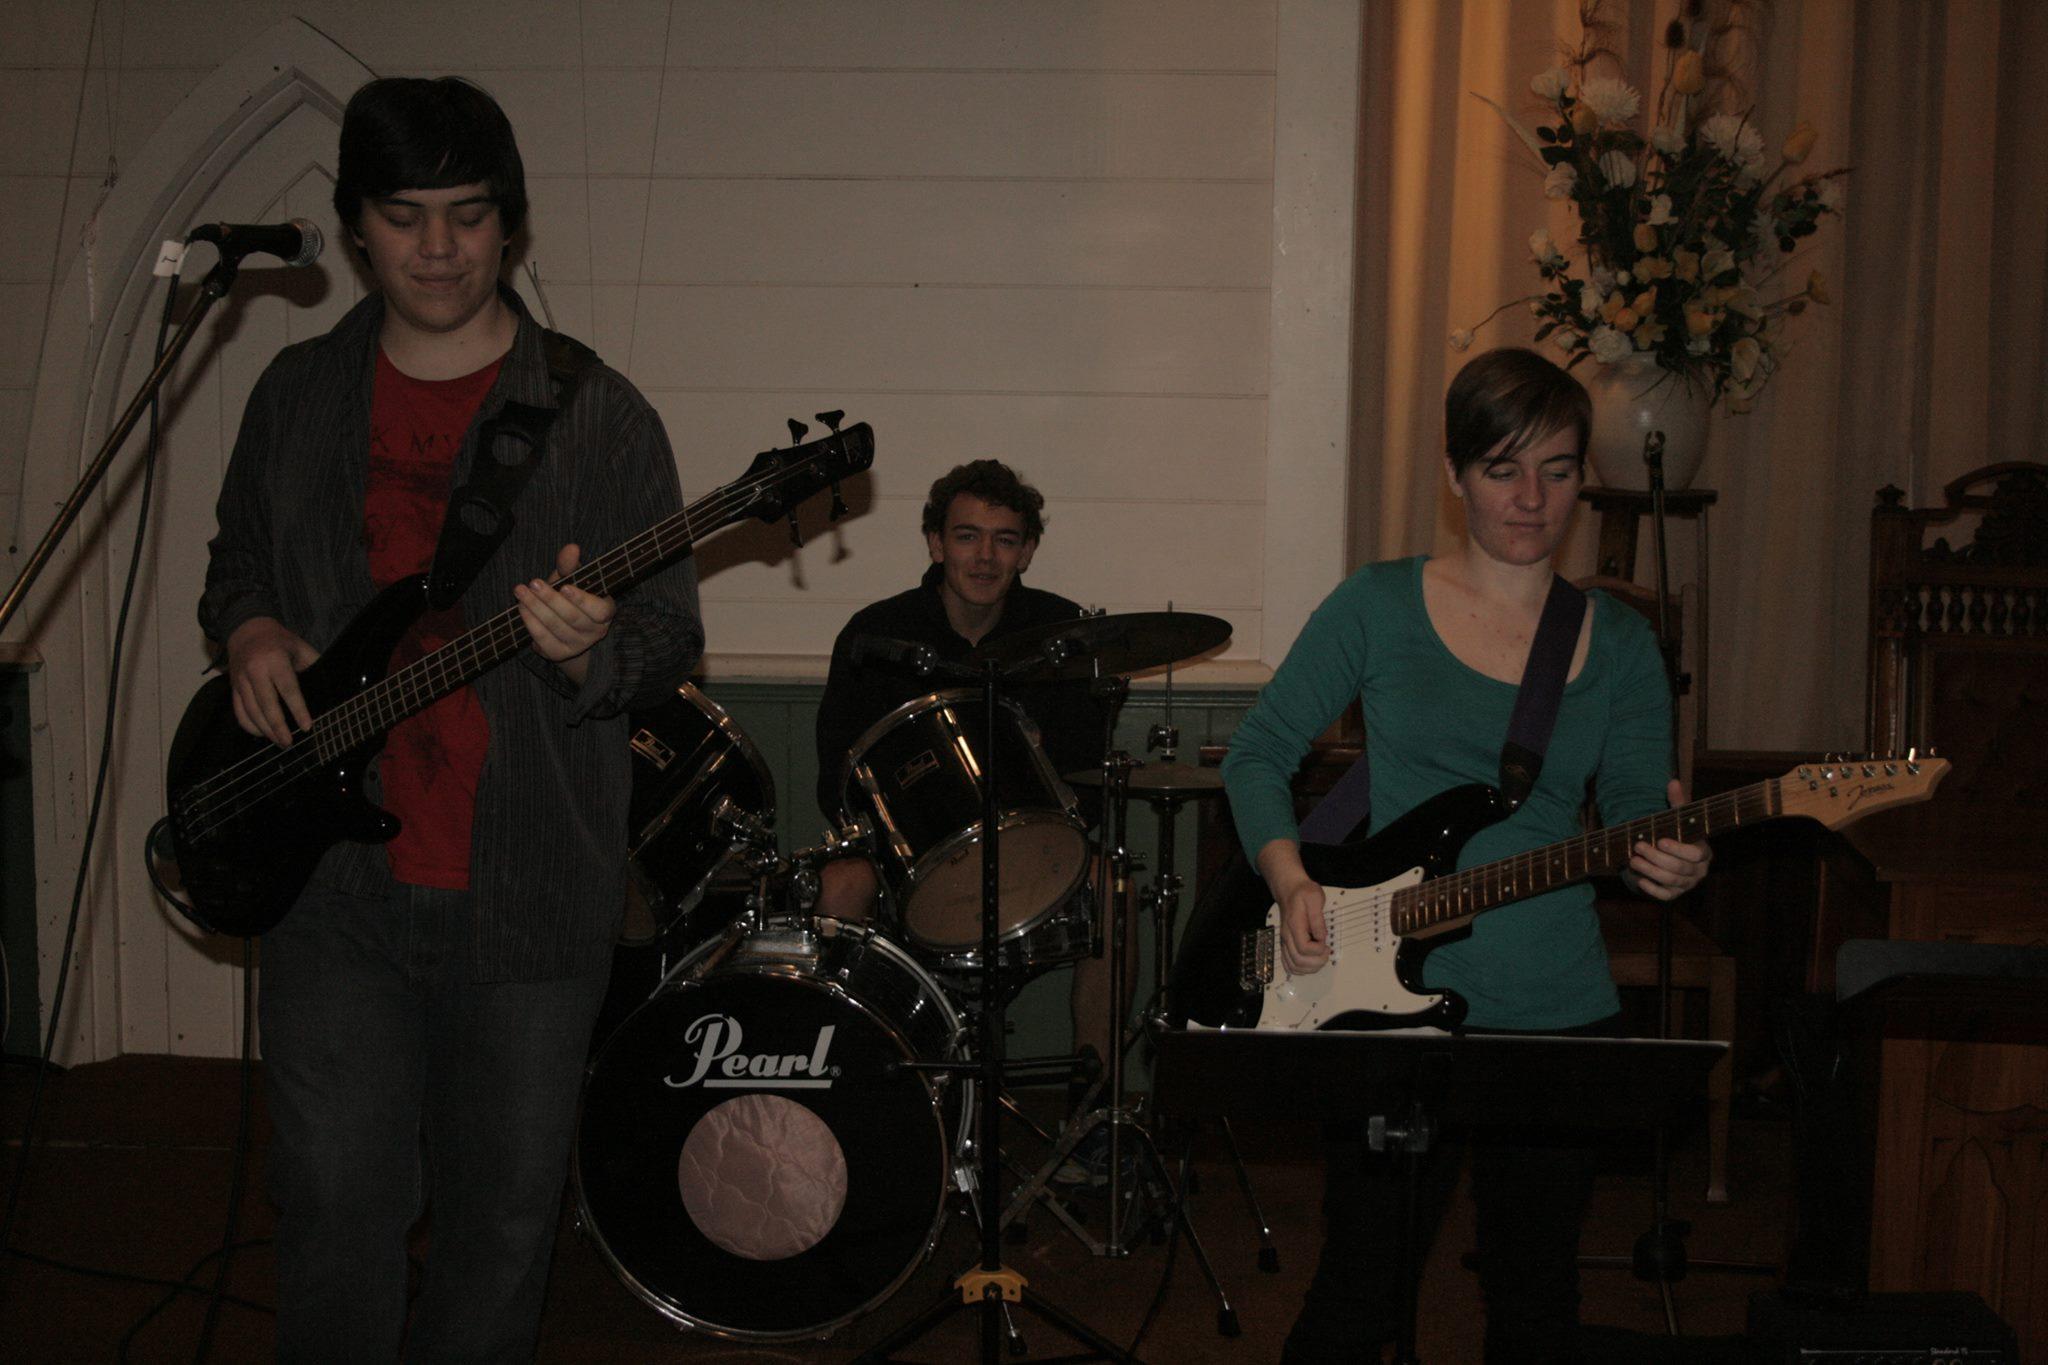 Band rehearsal at the church